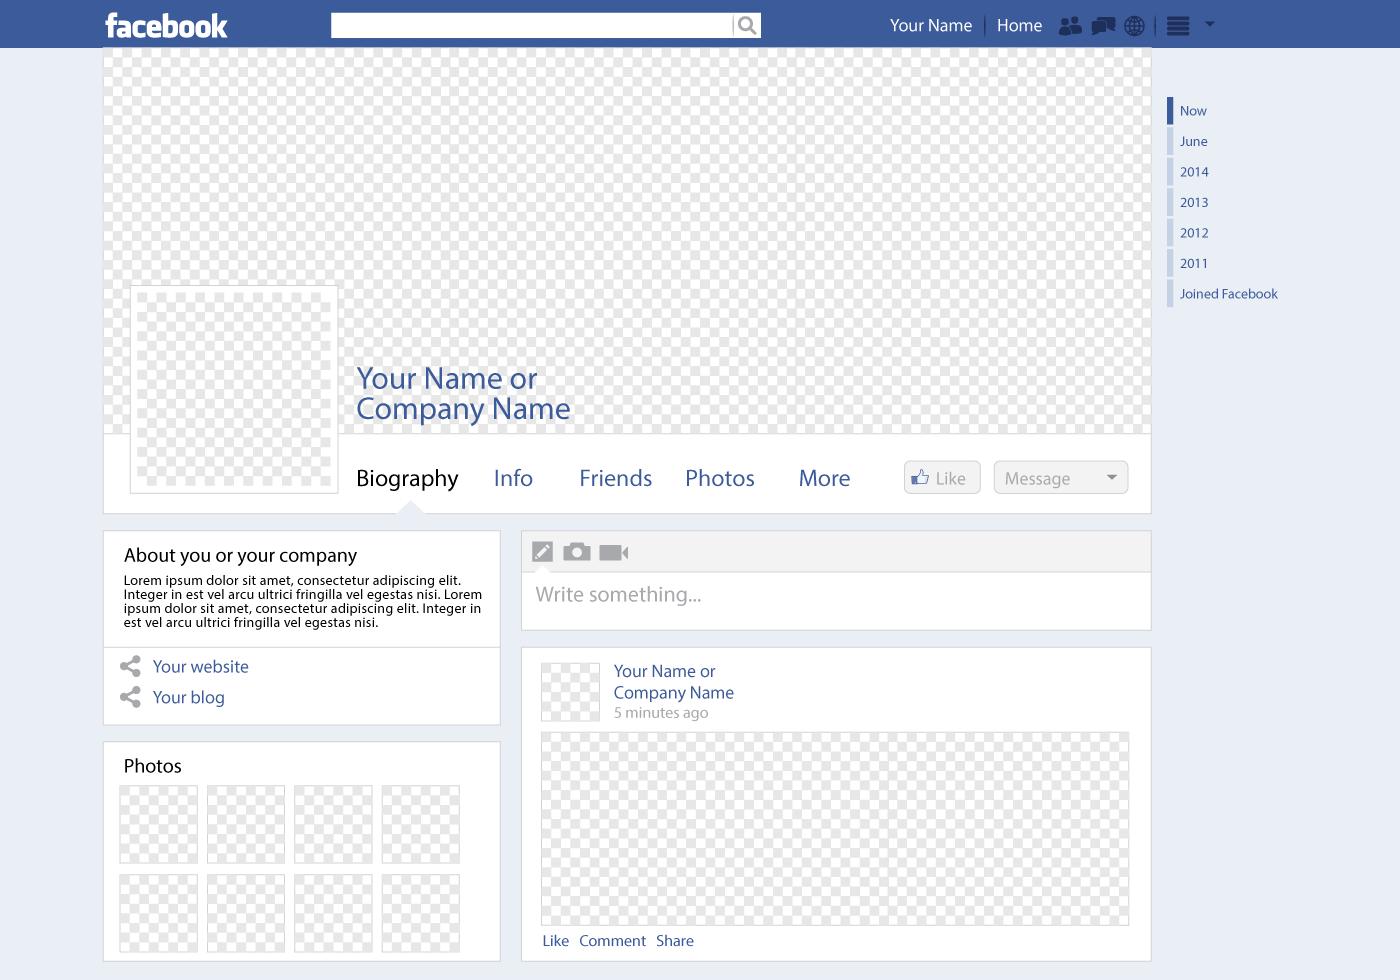 social-page-design-custom-header-content-profile